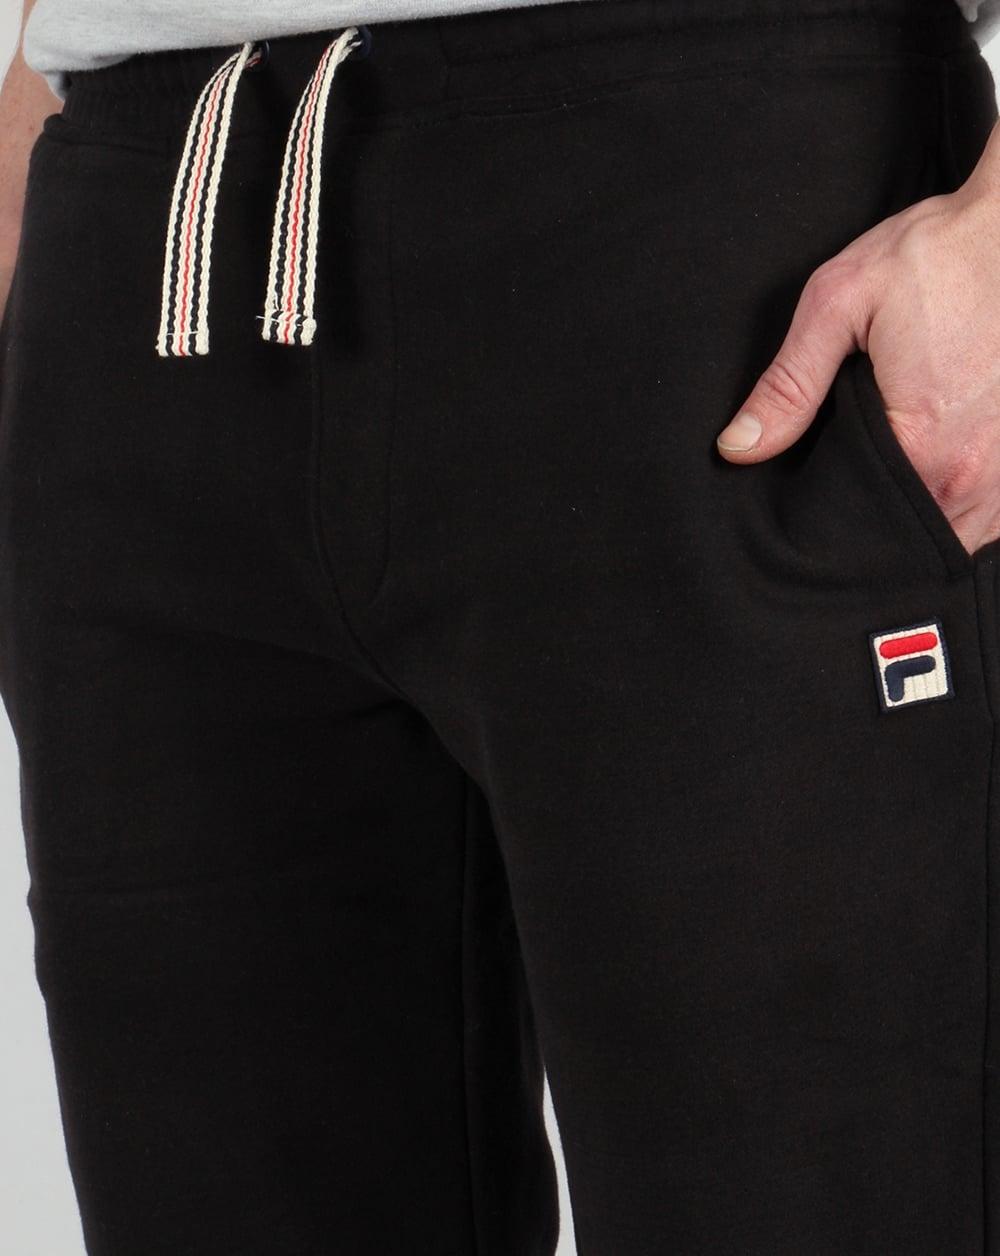 2ad435946cc0 Fila Vintage Livata Cuffed Track Pants Black,bottoms,tracksuit,mens